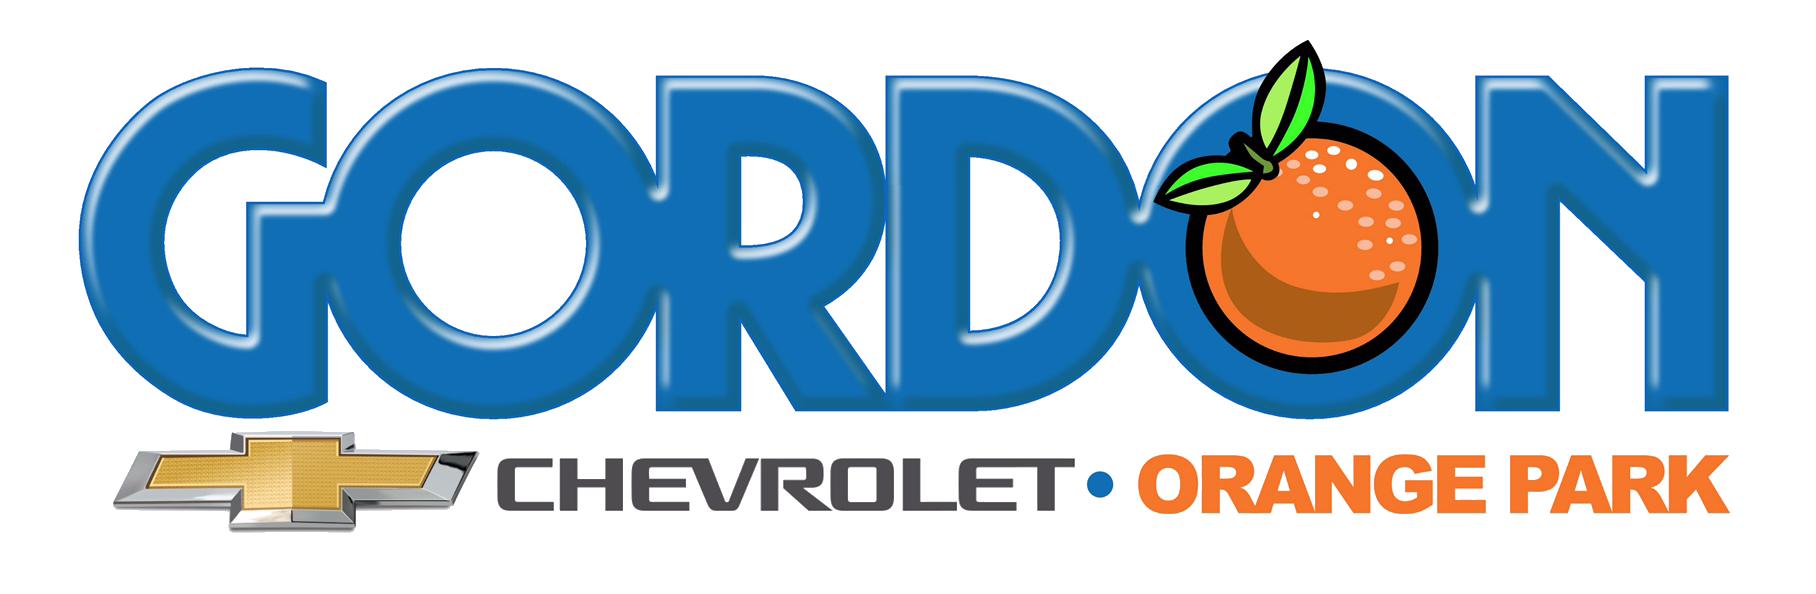 Gordon Chevrolet of Orange Park, FL